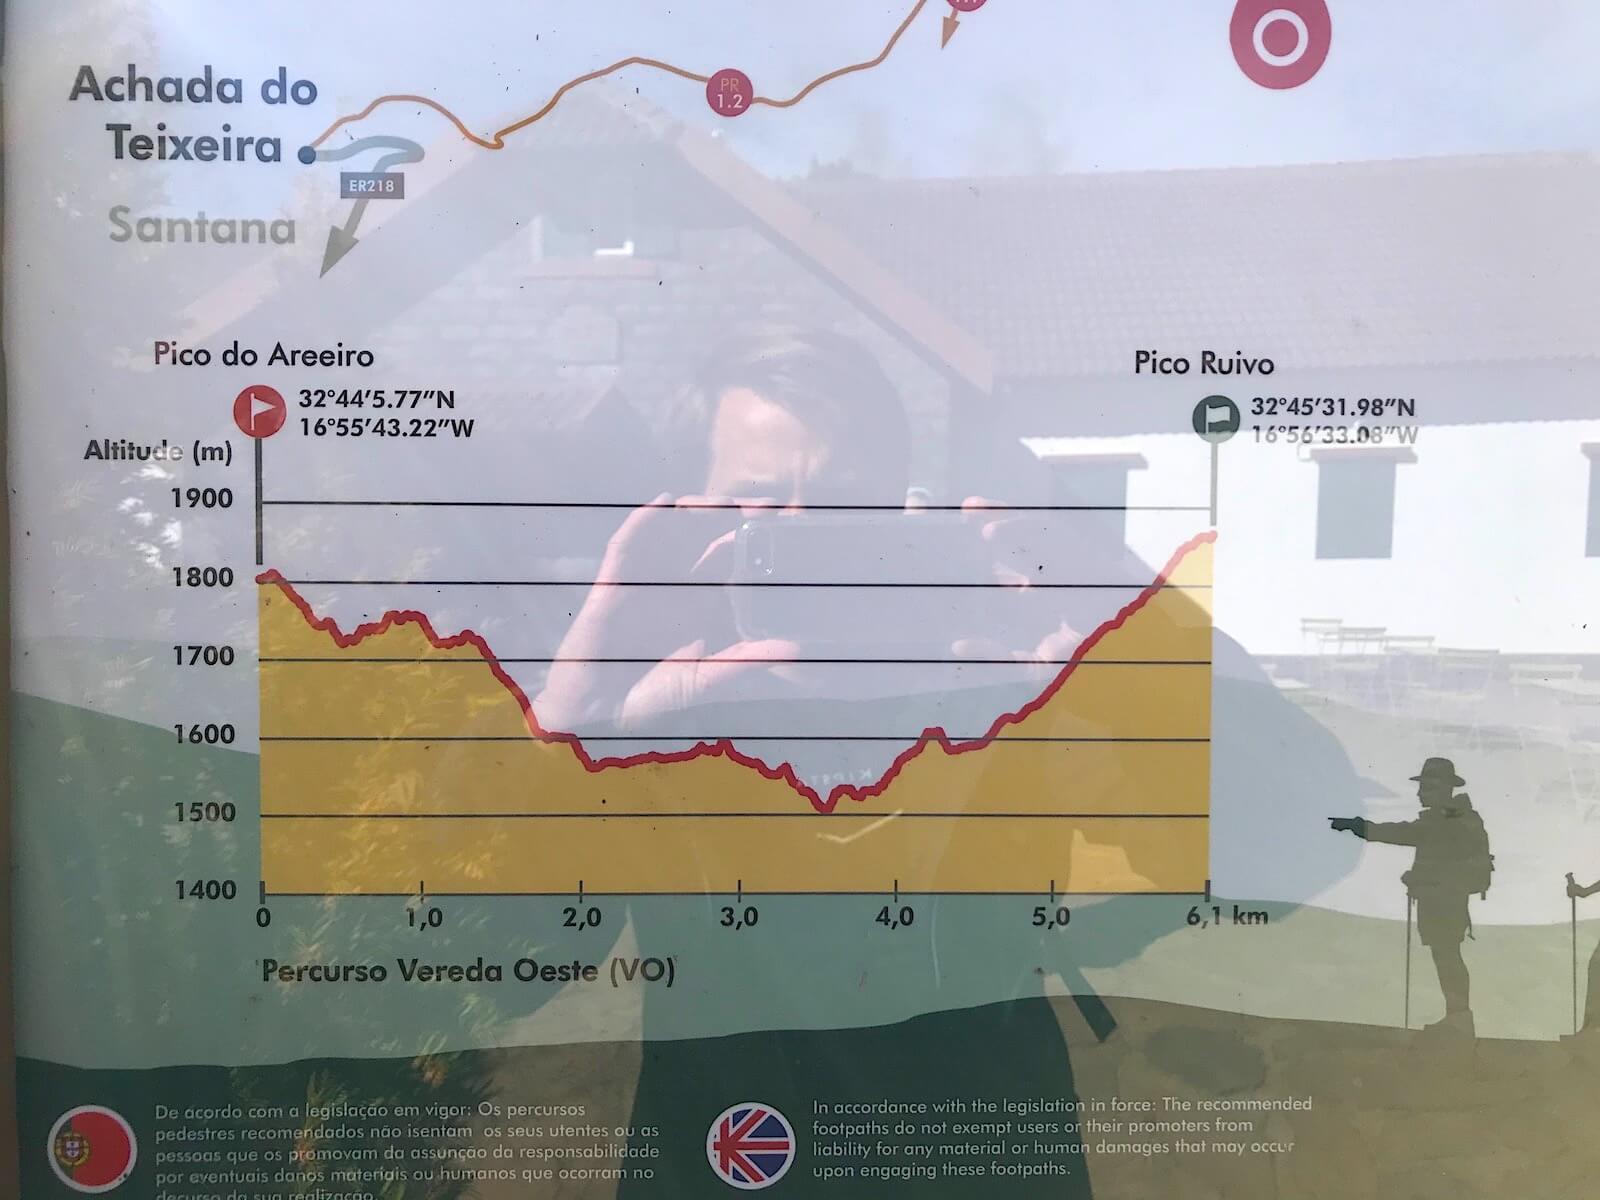 Hoogteverschil op hike PR1 Pico do Areeiro naar Pico Ruivo